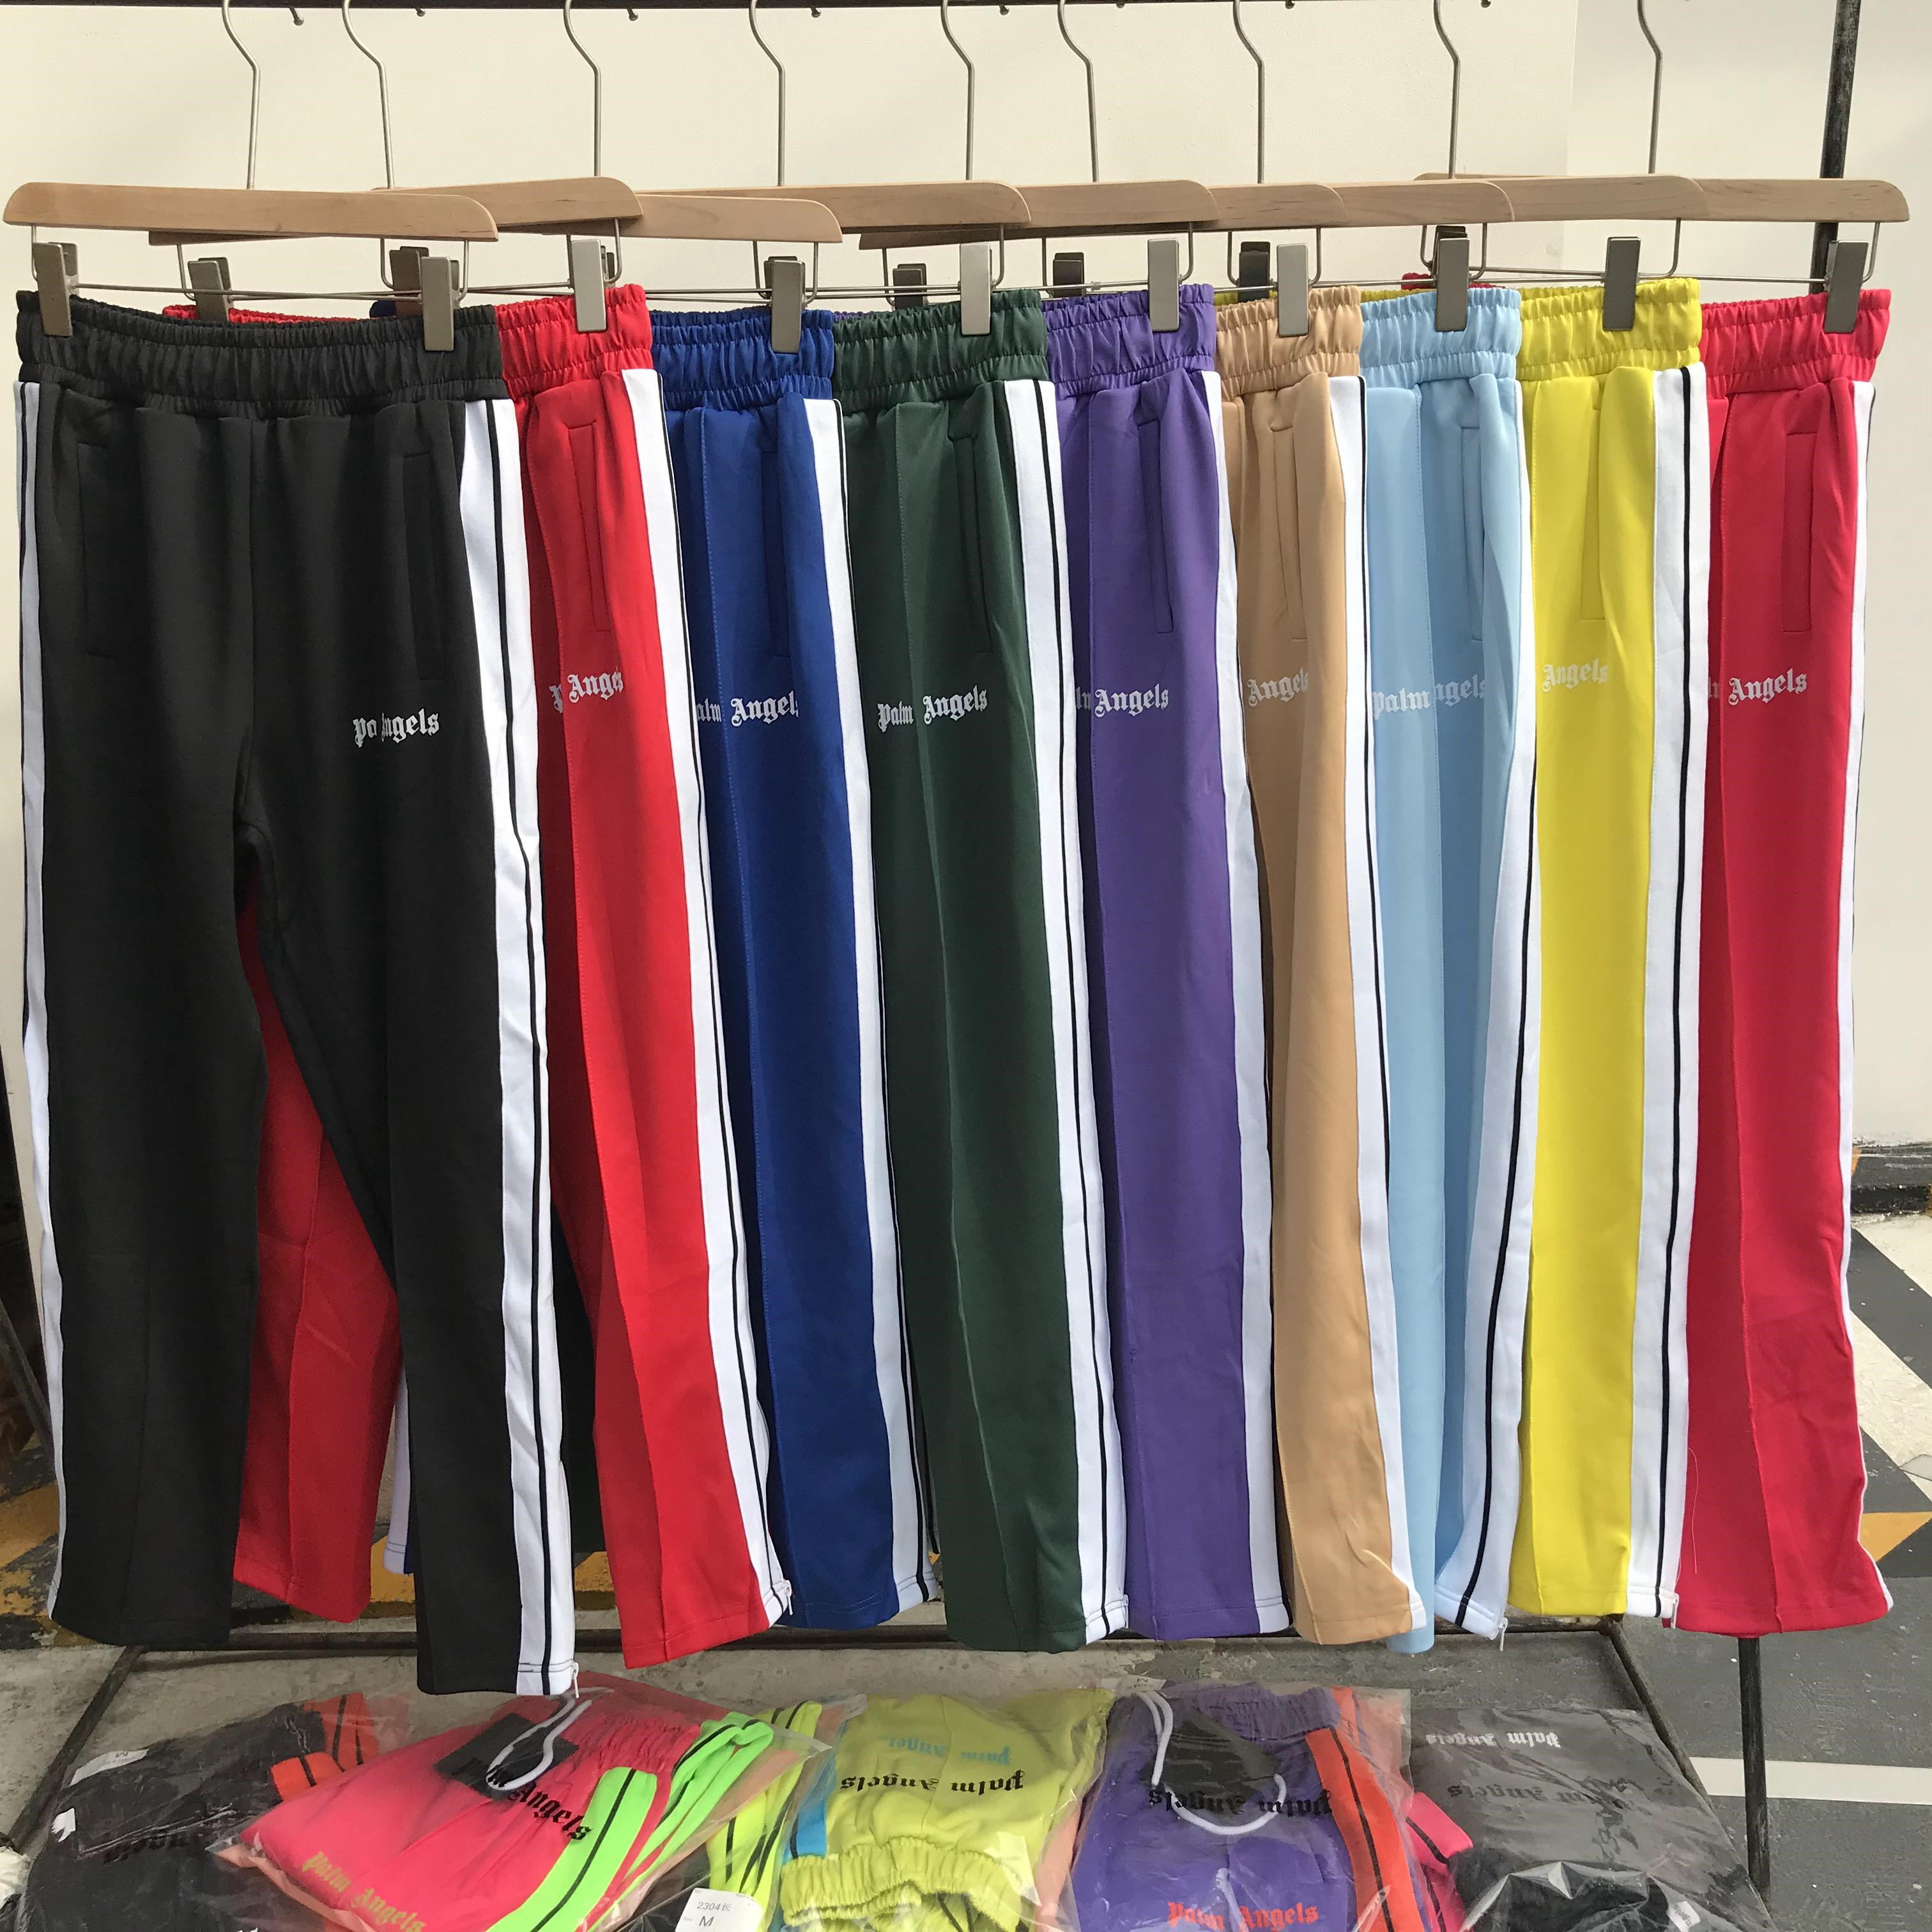 Palm Angels striped side zipper retro campus men's women's sports casual